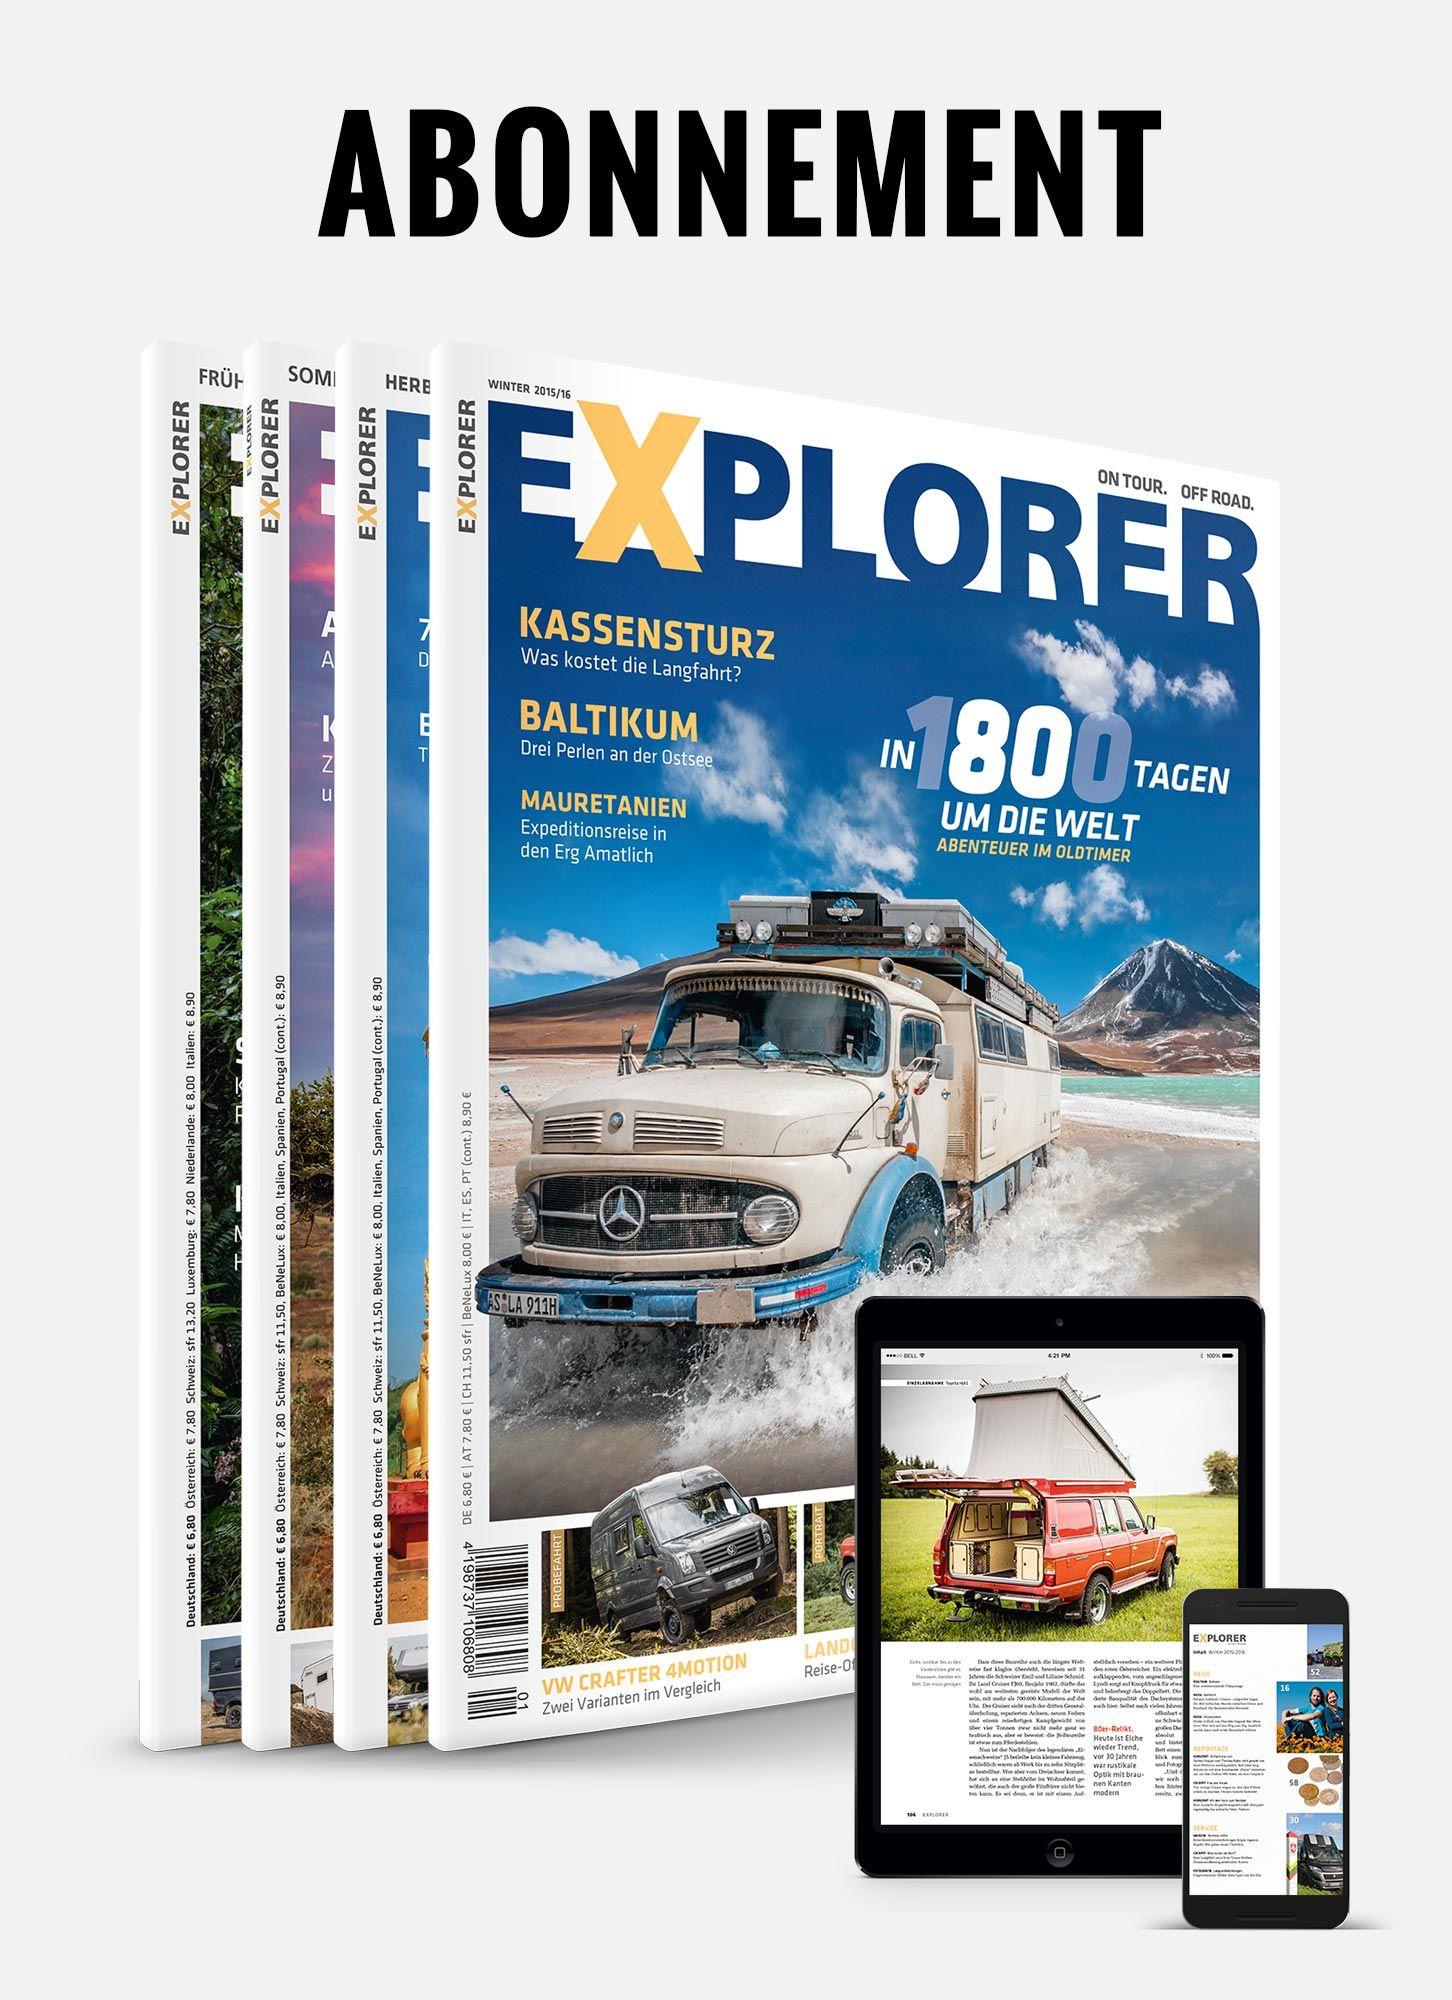 EXPLORER Magazin Abo